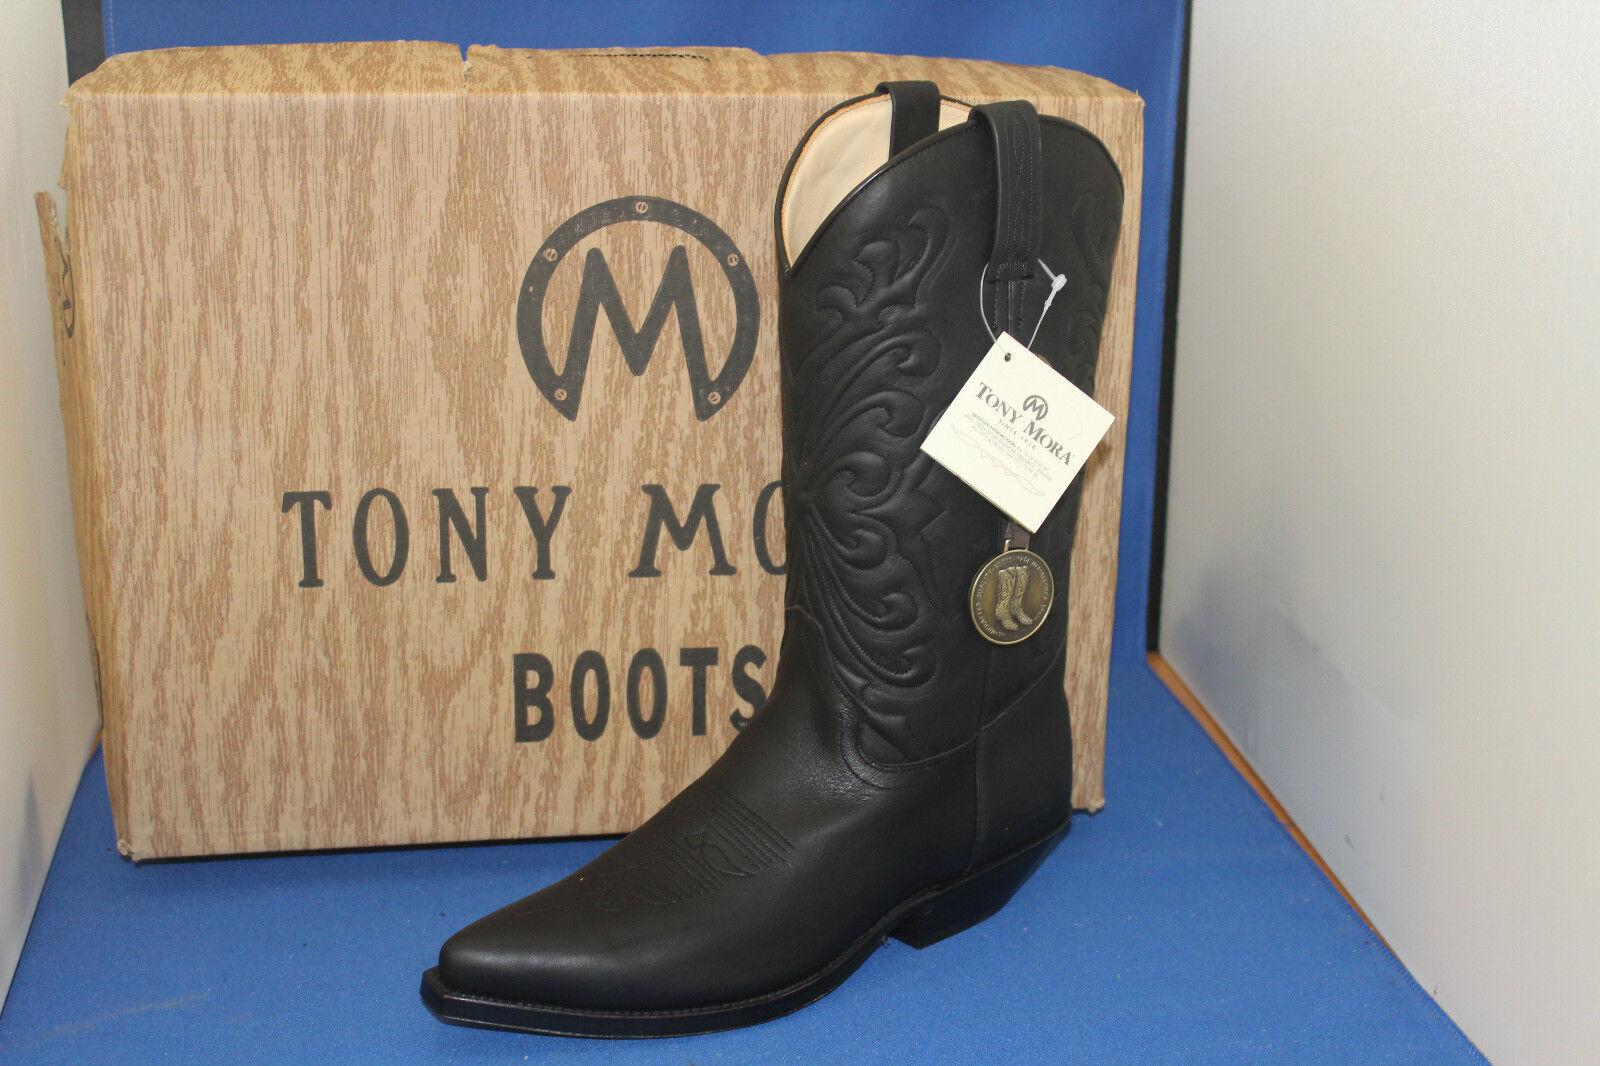 TONY MORA Boots Stiefel negro westernstiefel cowboystiefel  gr. 38  neu  leder